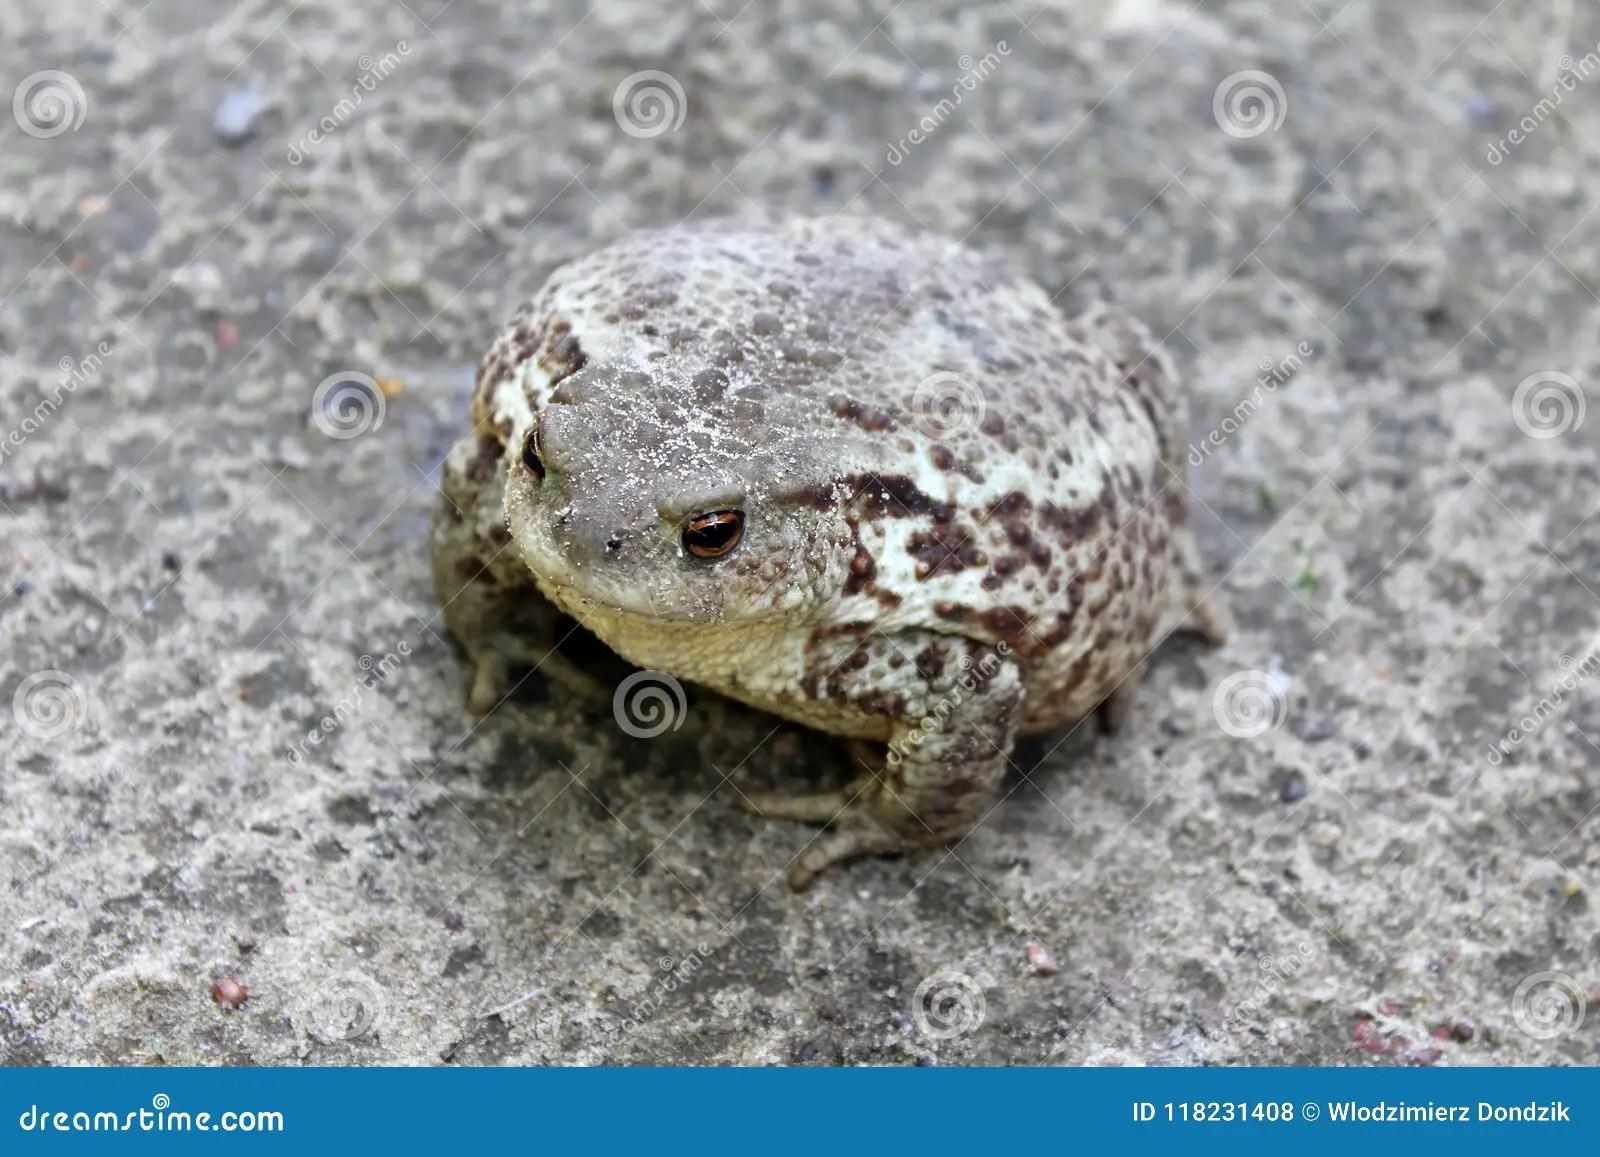 Camouflage Animals Stock Photos